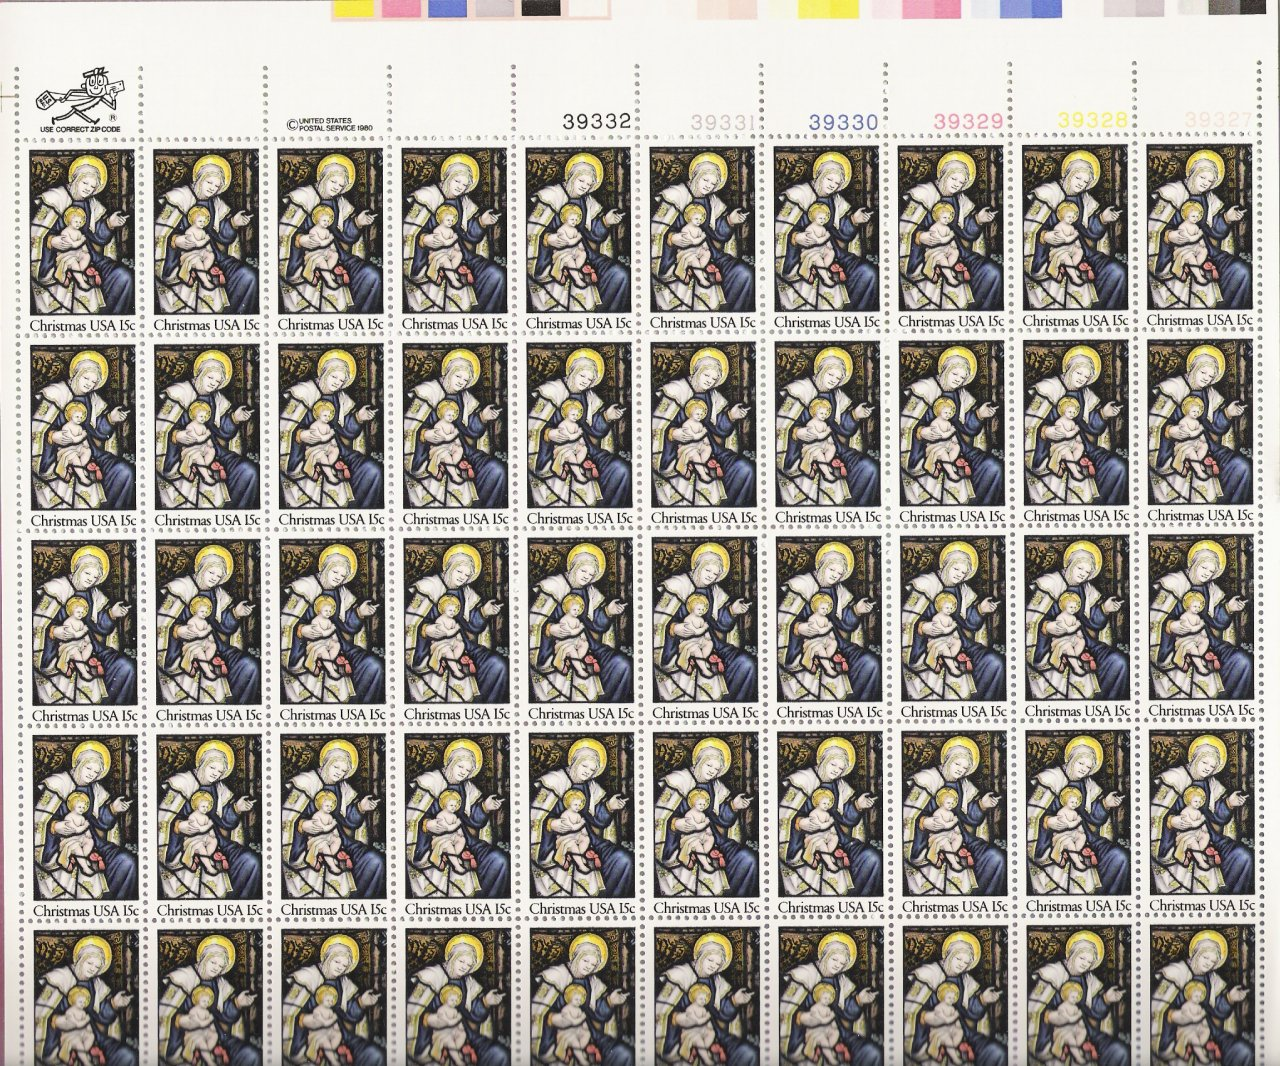 US Scott 1842 - Sheet of 50 - Christmas 1980-religious  - Mint Never Hinged